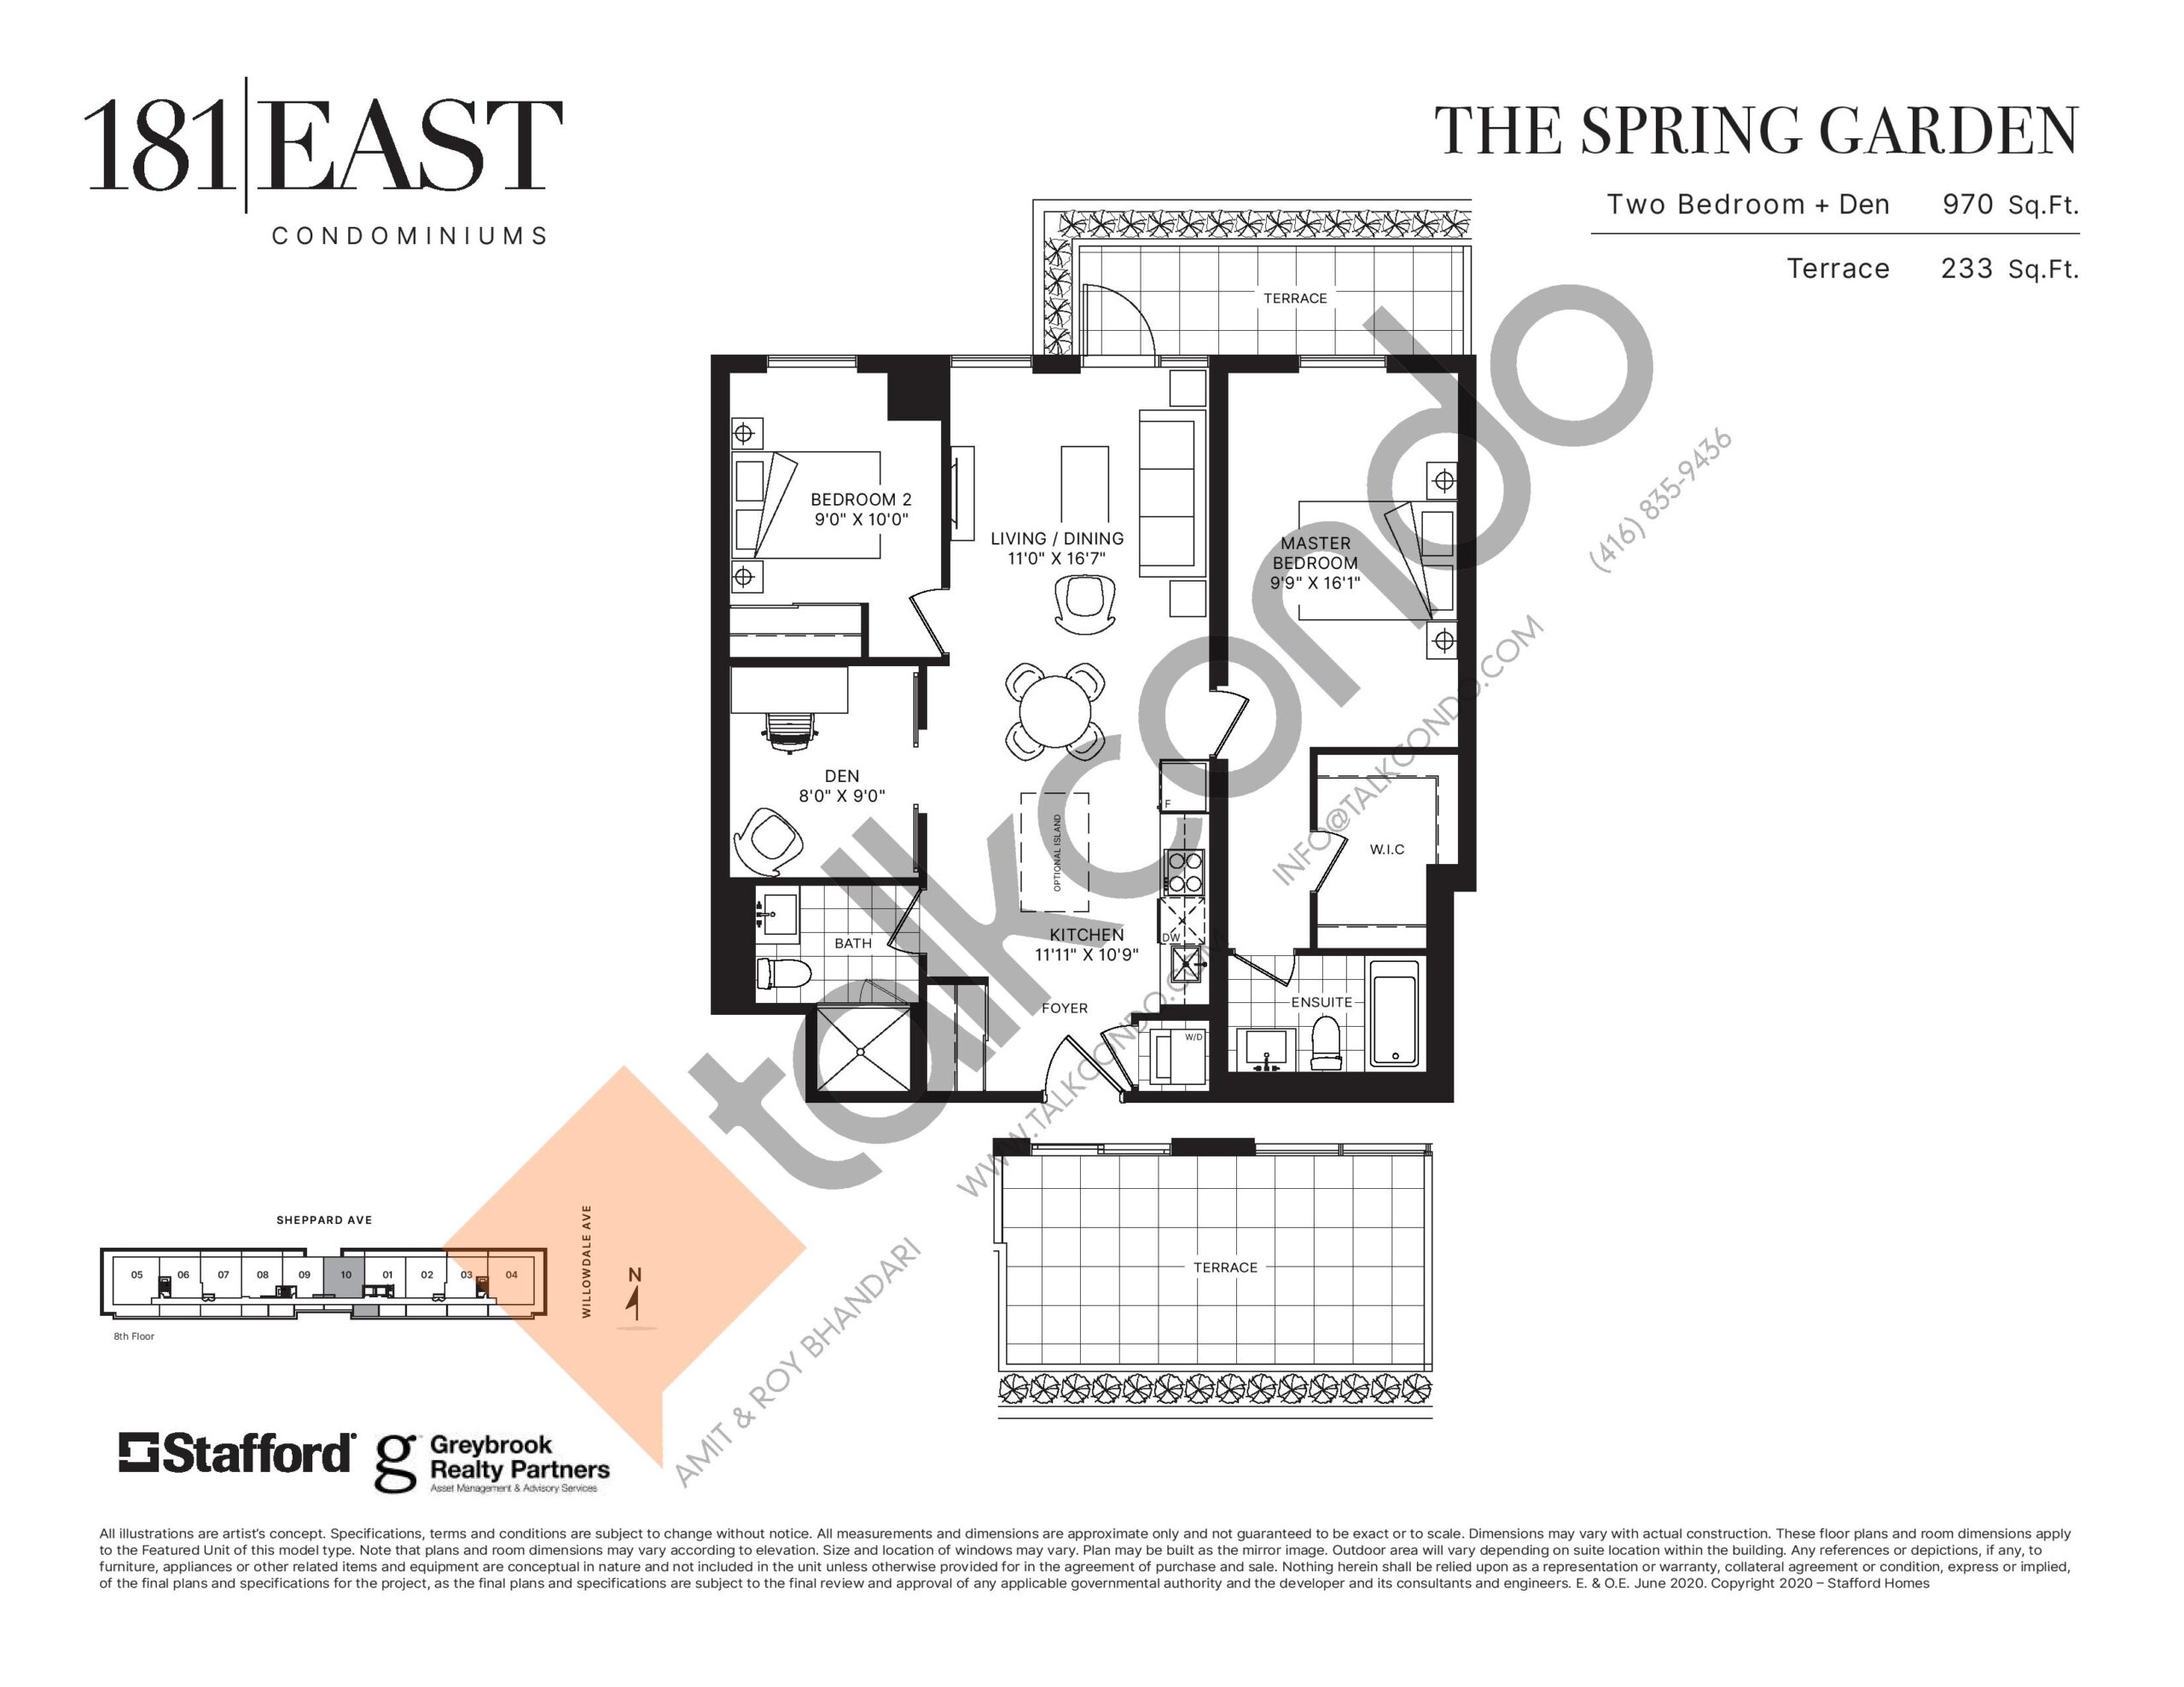 The Spring Garden Floor Plan at 181 East Condos - 970 sq.ft